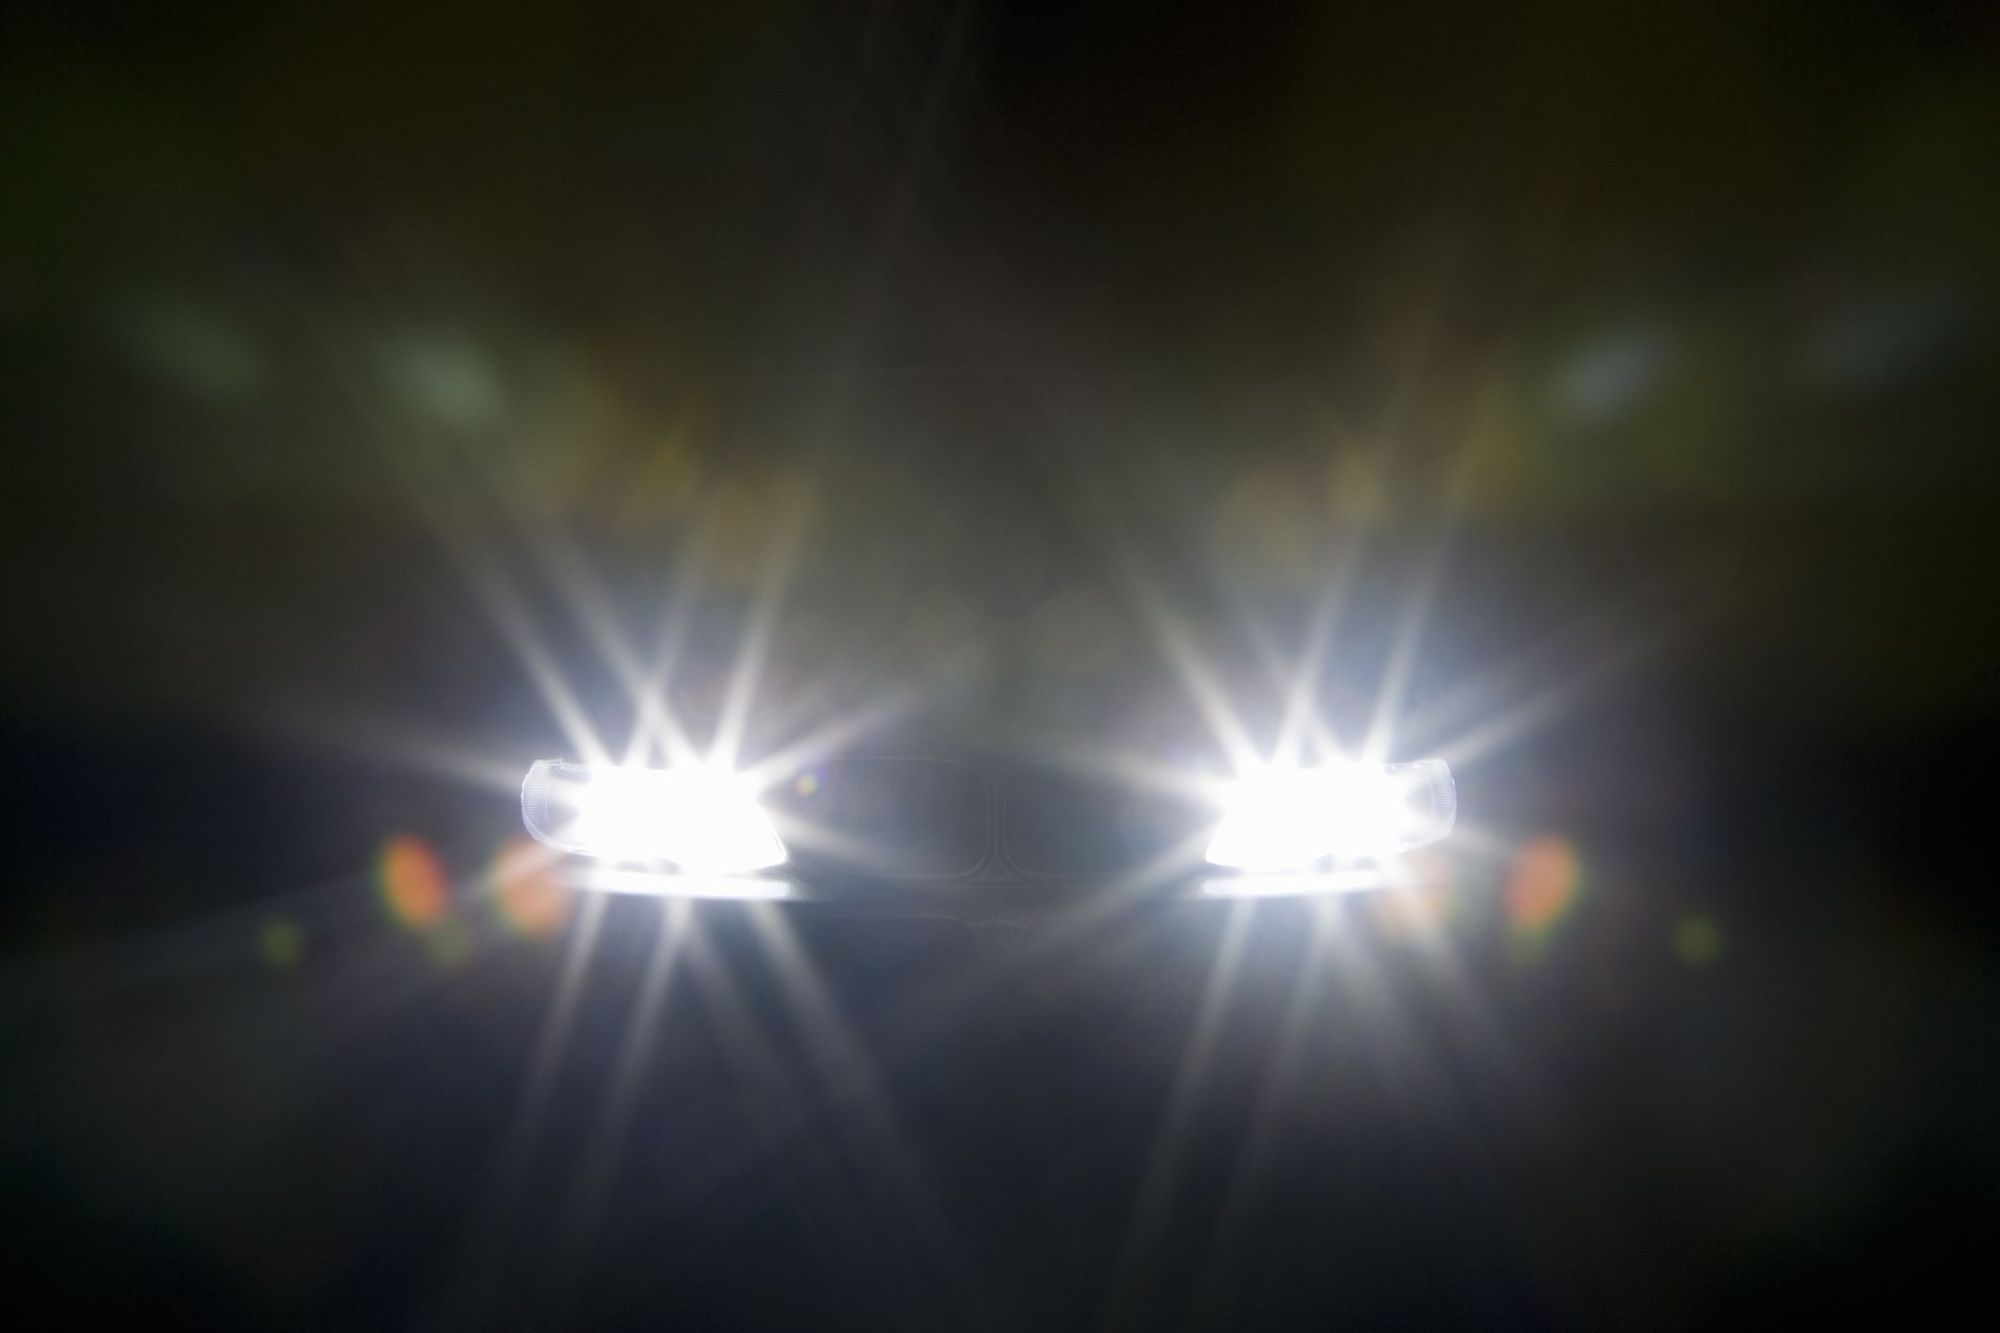 hight resolution of headlights glaring against dark background